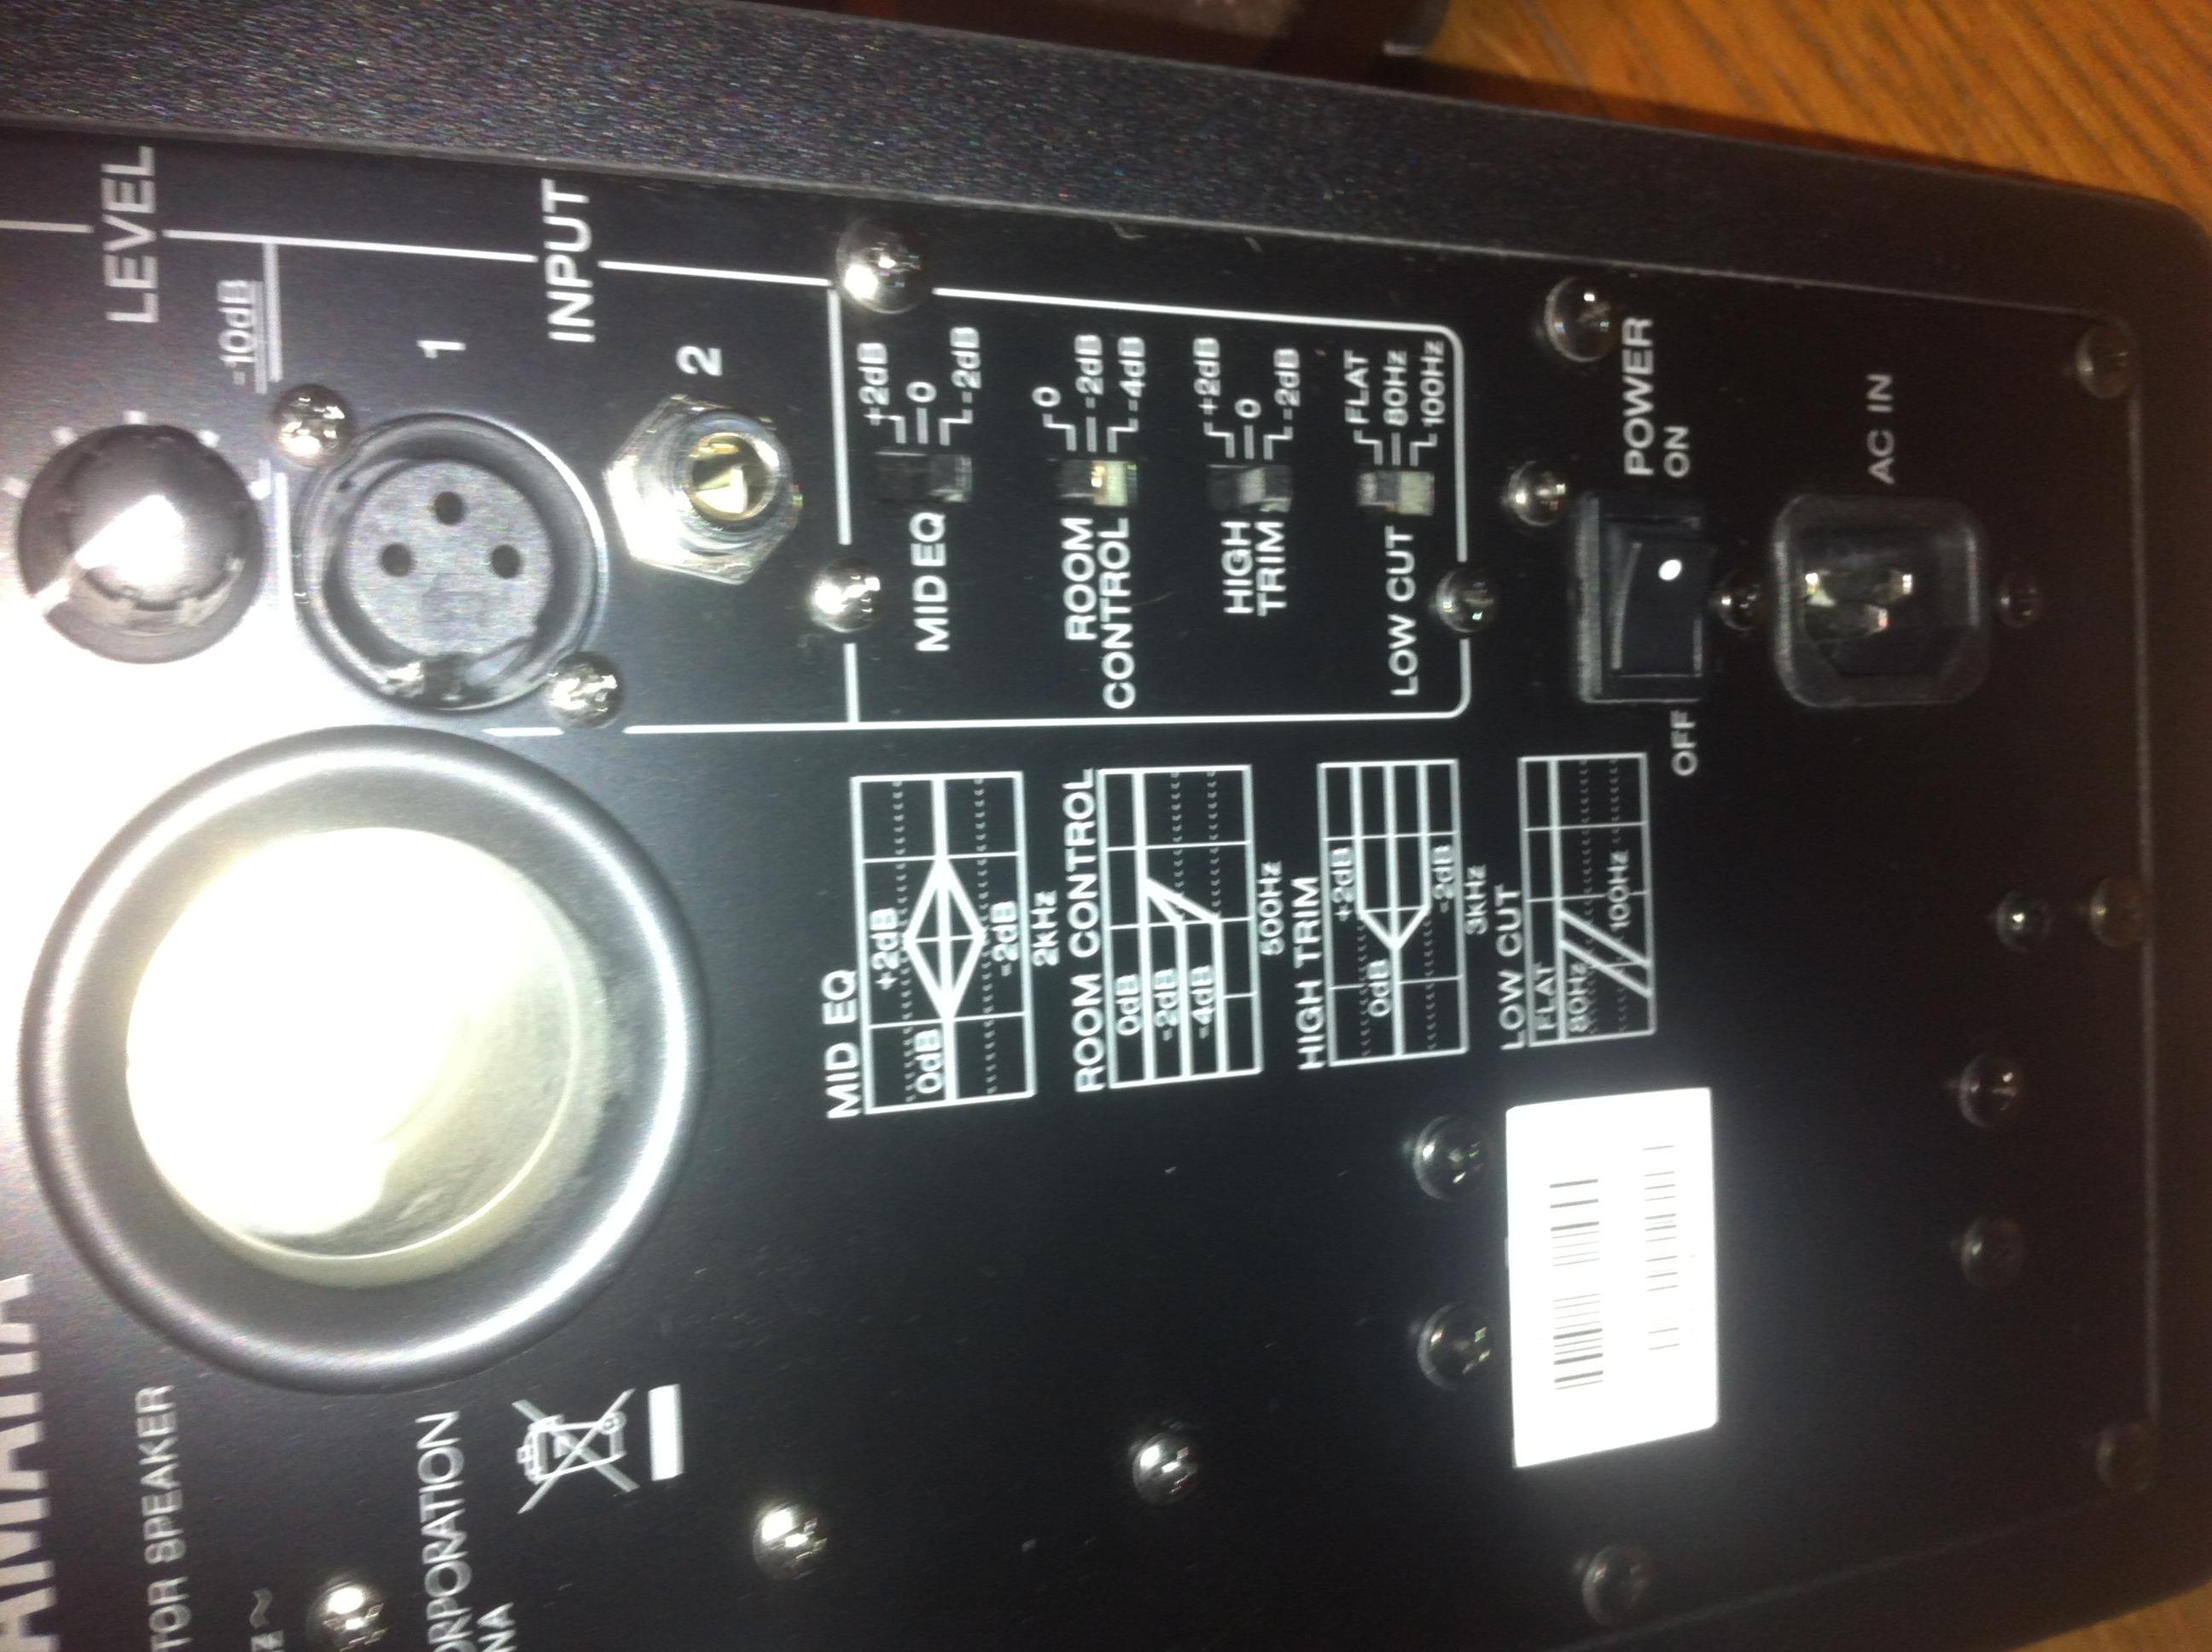 Yamaha hs50m image 495345 audiofanzine for Yamaha hs50m review